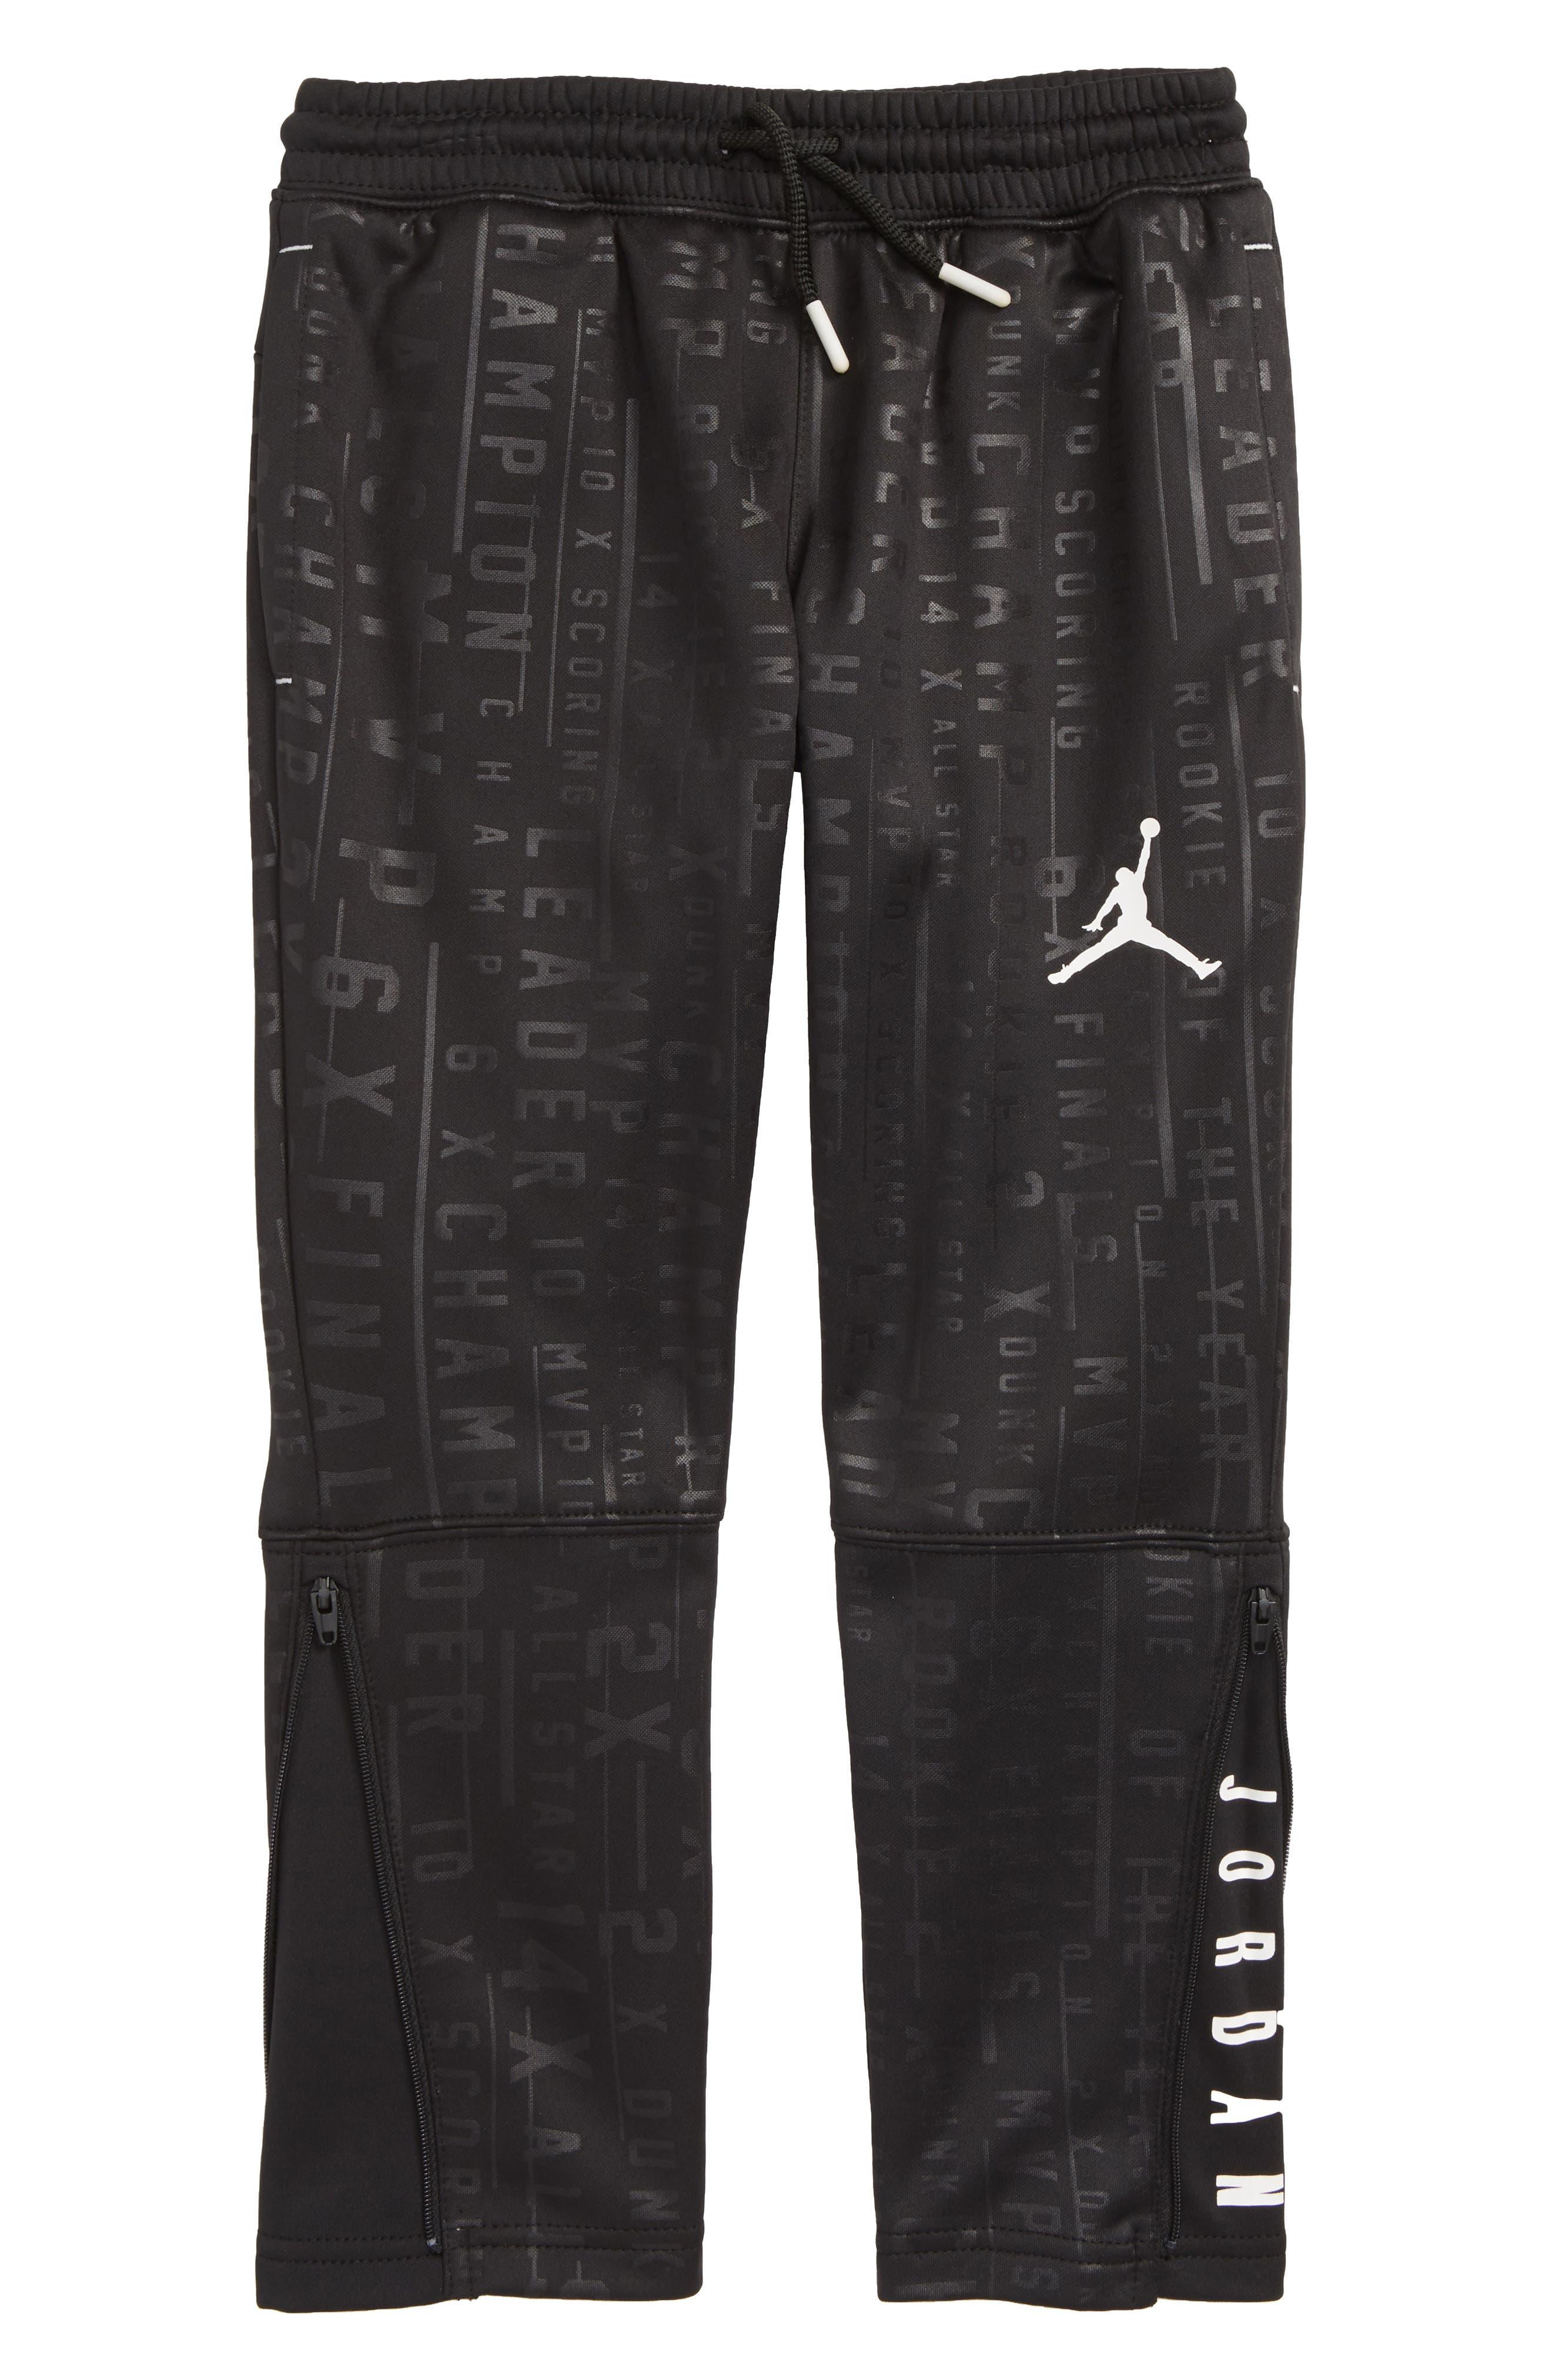 Jordan 23 Tech Accolades Pants,                             Main thumbnail 1, color,                             BLACK/ WHITE